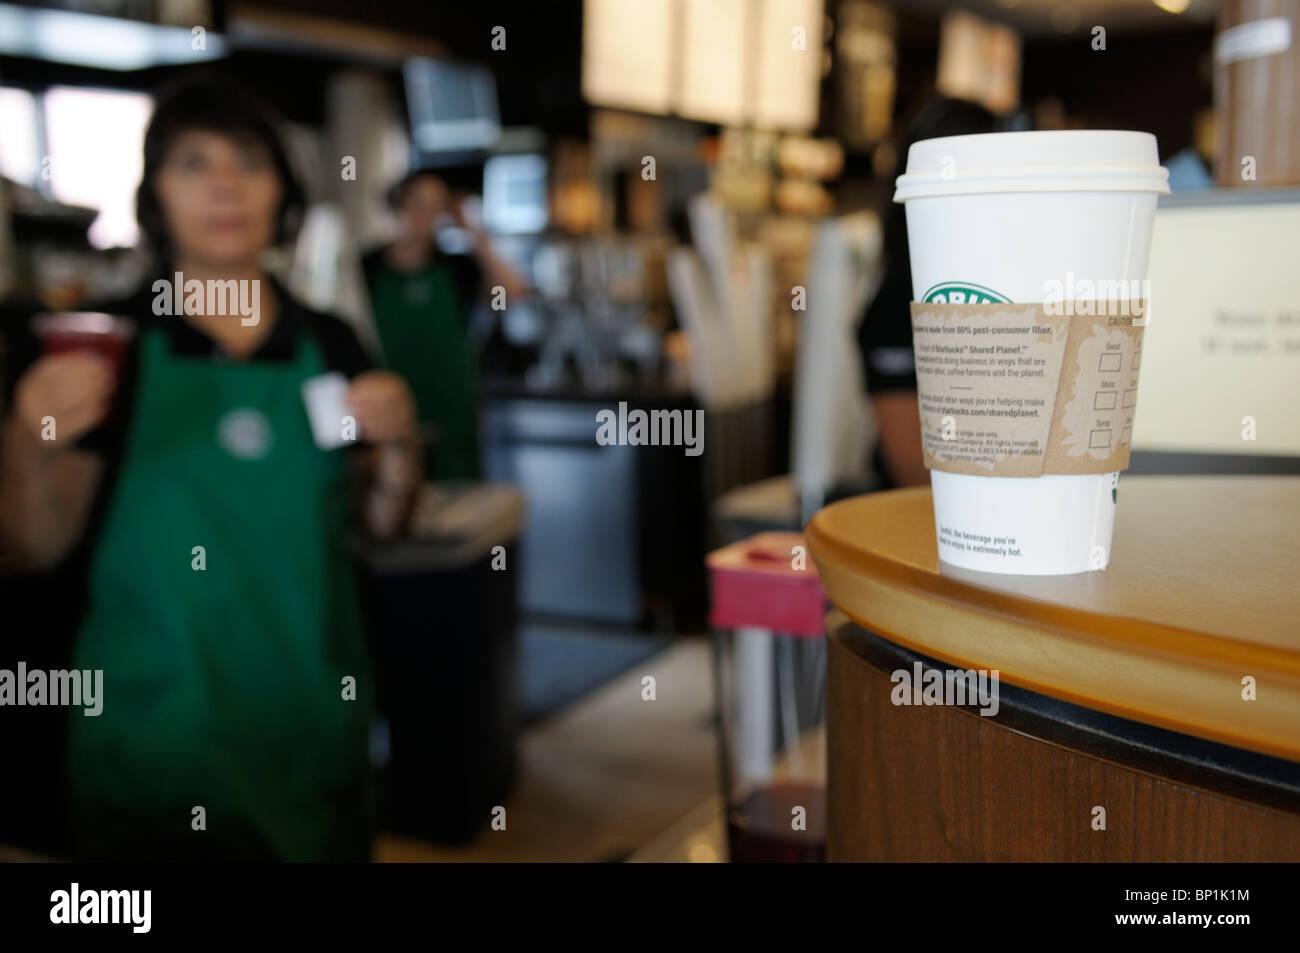 Starbucks barista stock options